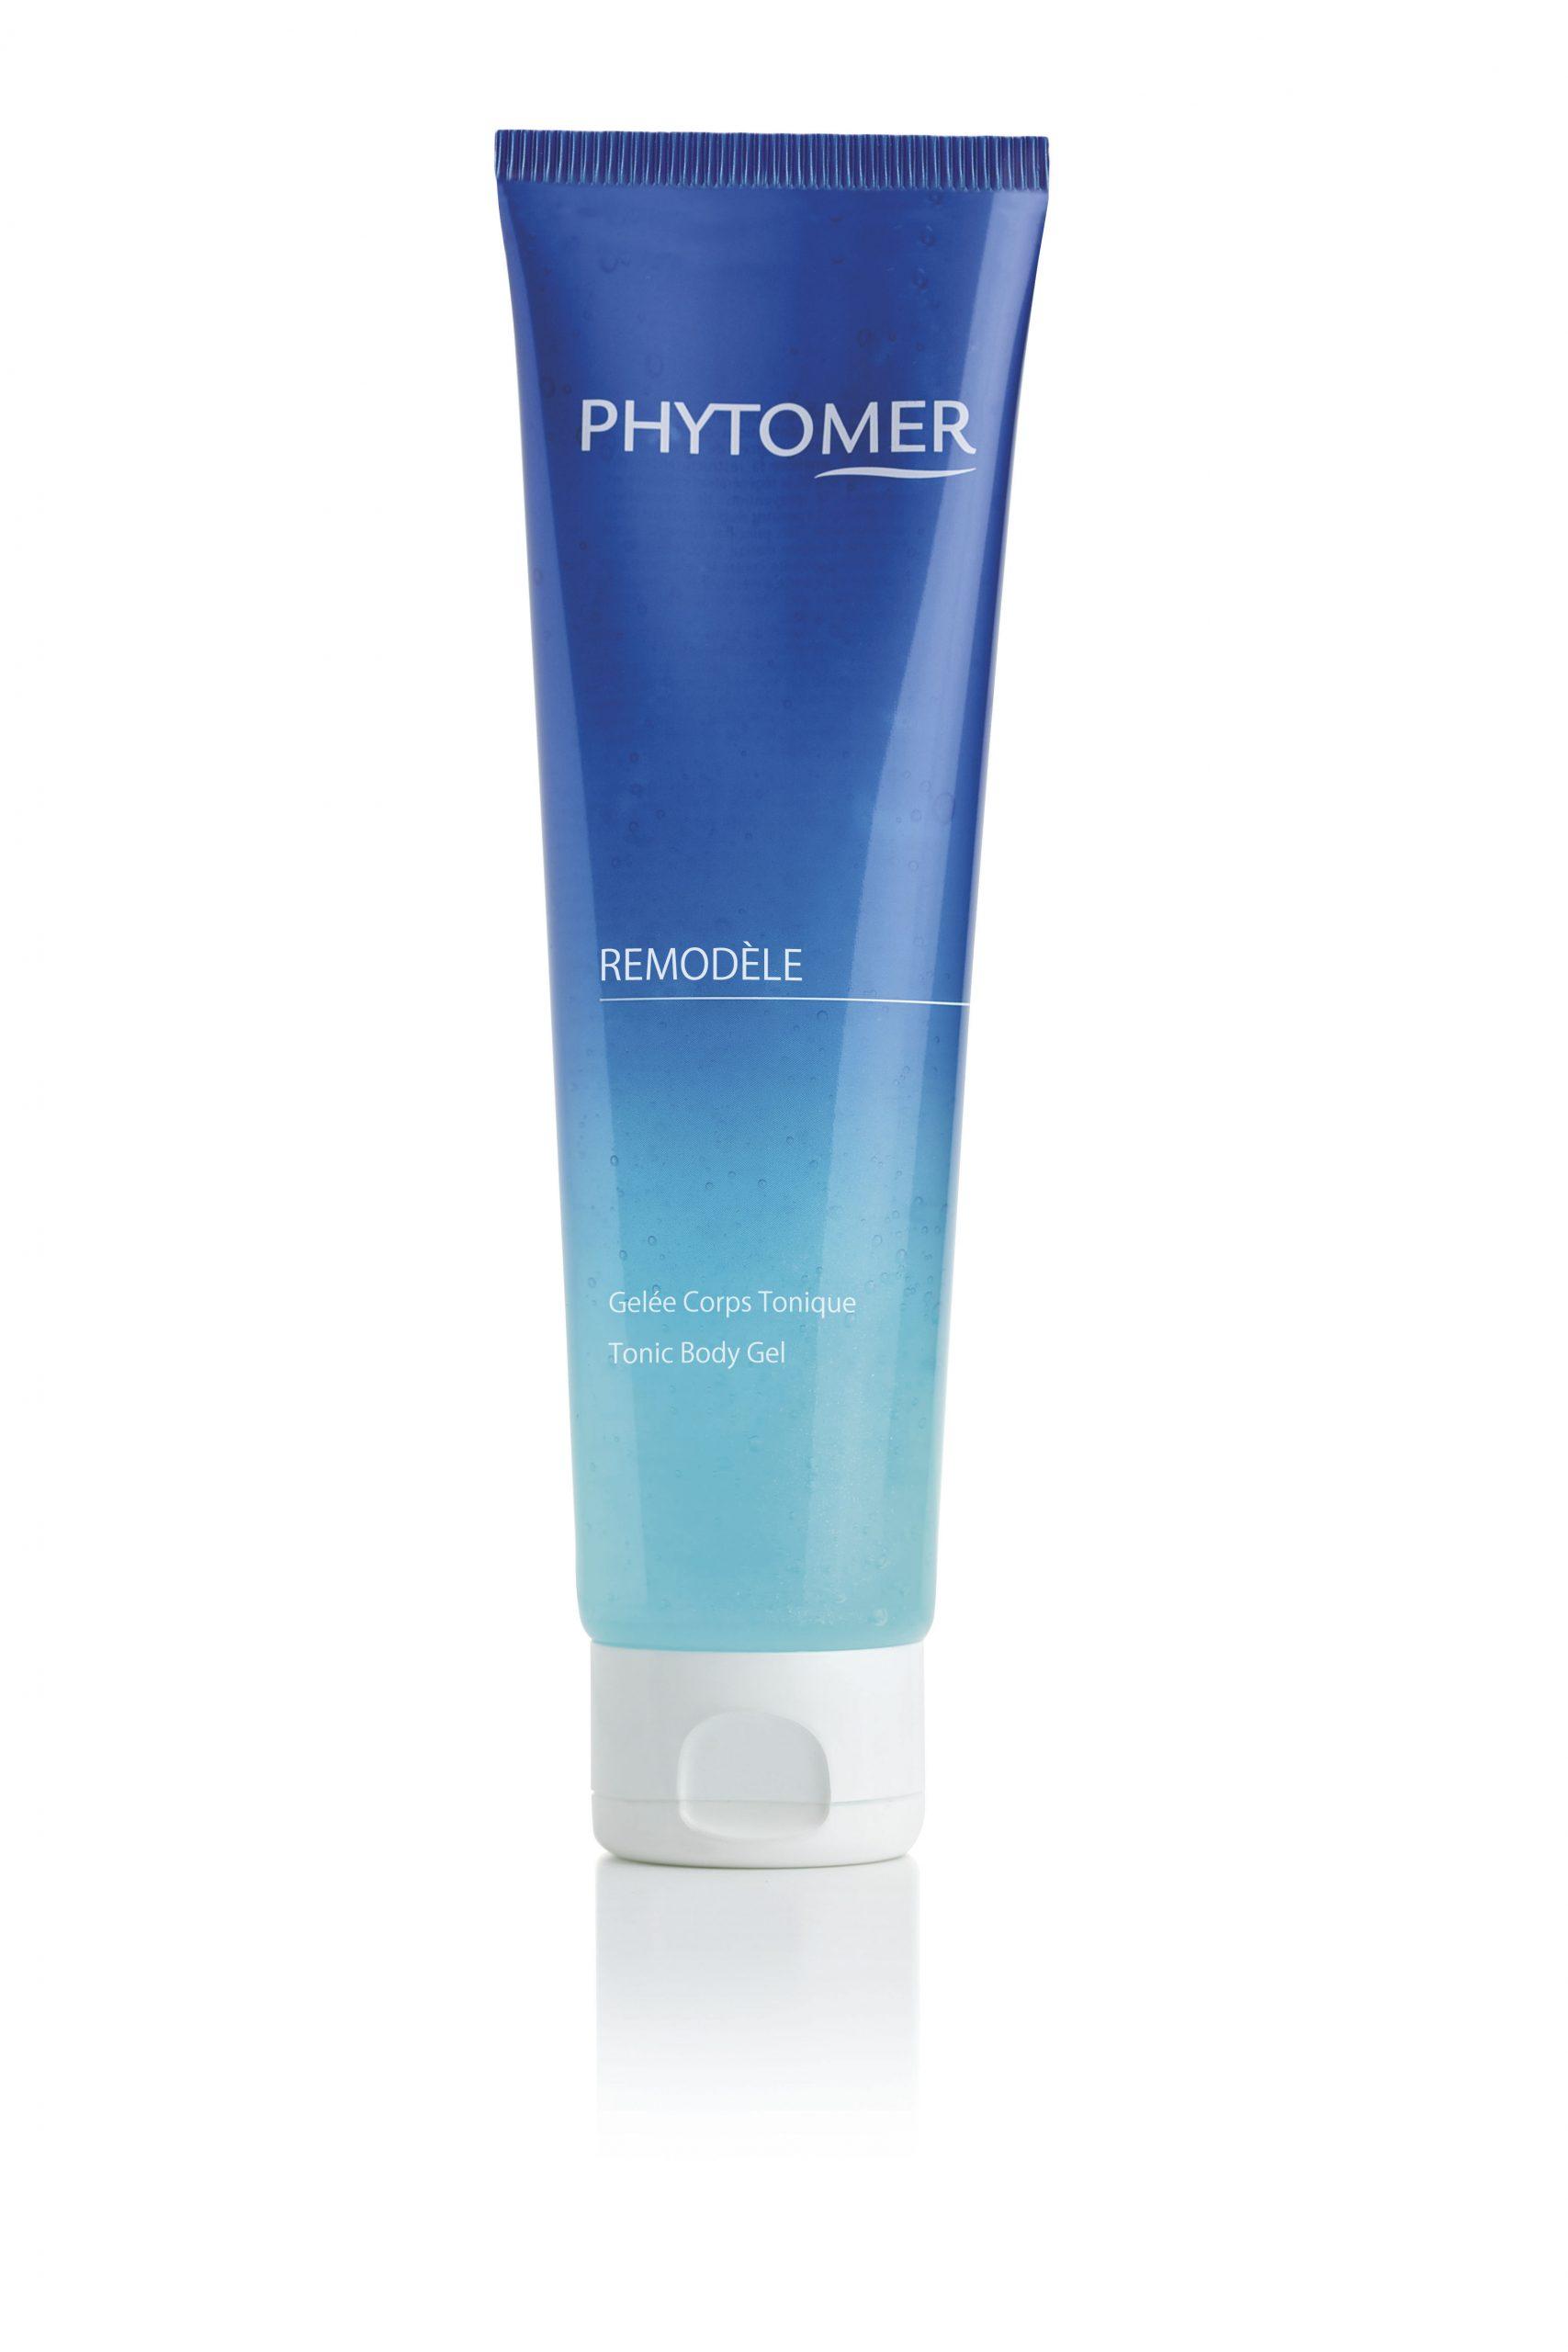 PhytomerREMODELE_TONIC_BODY_GEL